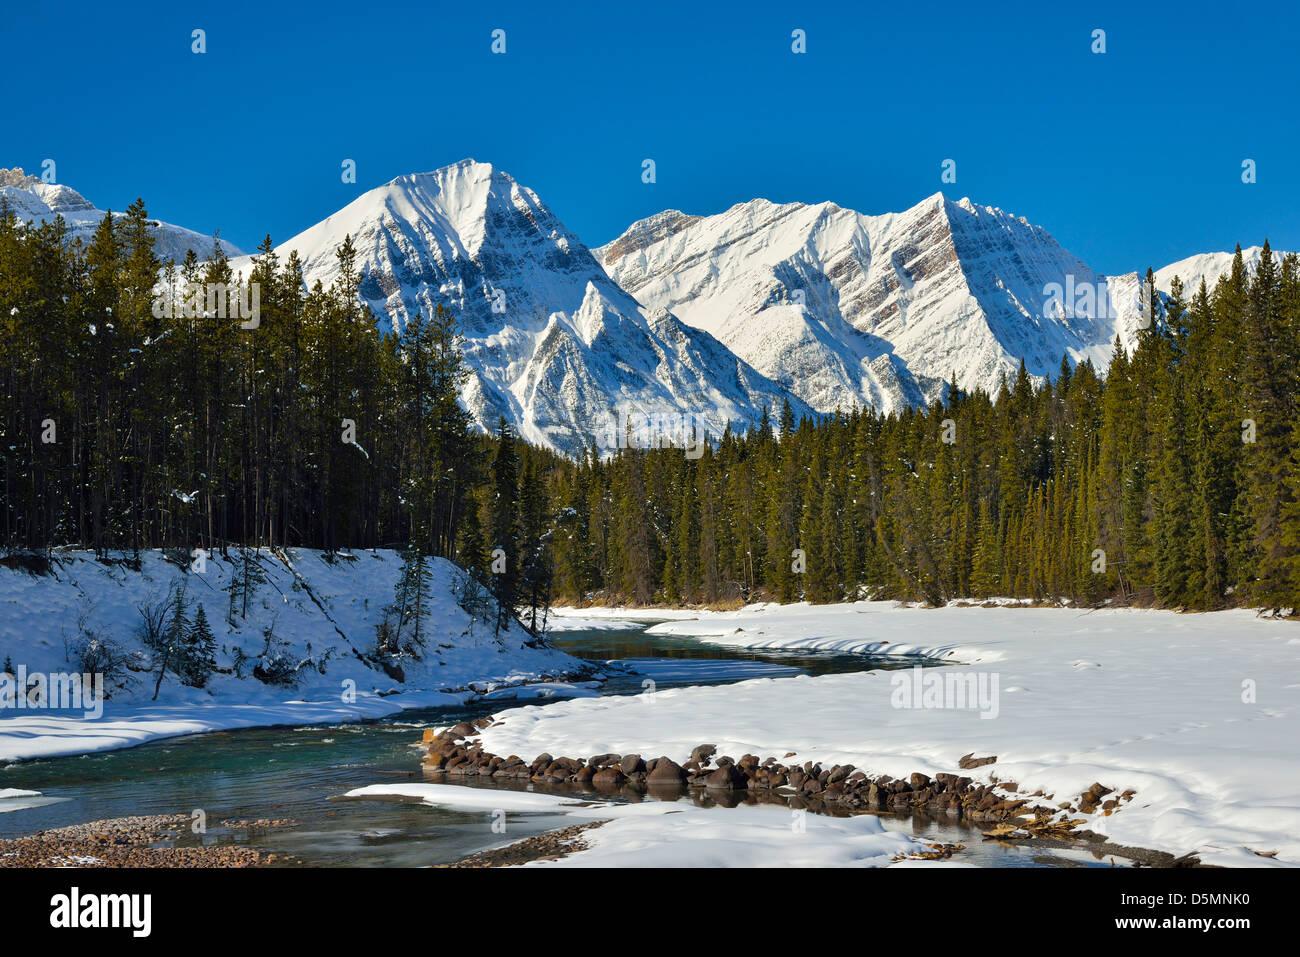 Snowcapped Imágenes De Stock Snowcapped Fotos De Stock: Snow Capped Rocky Mountains Stock Photos & Snow Capped